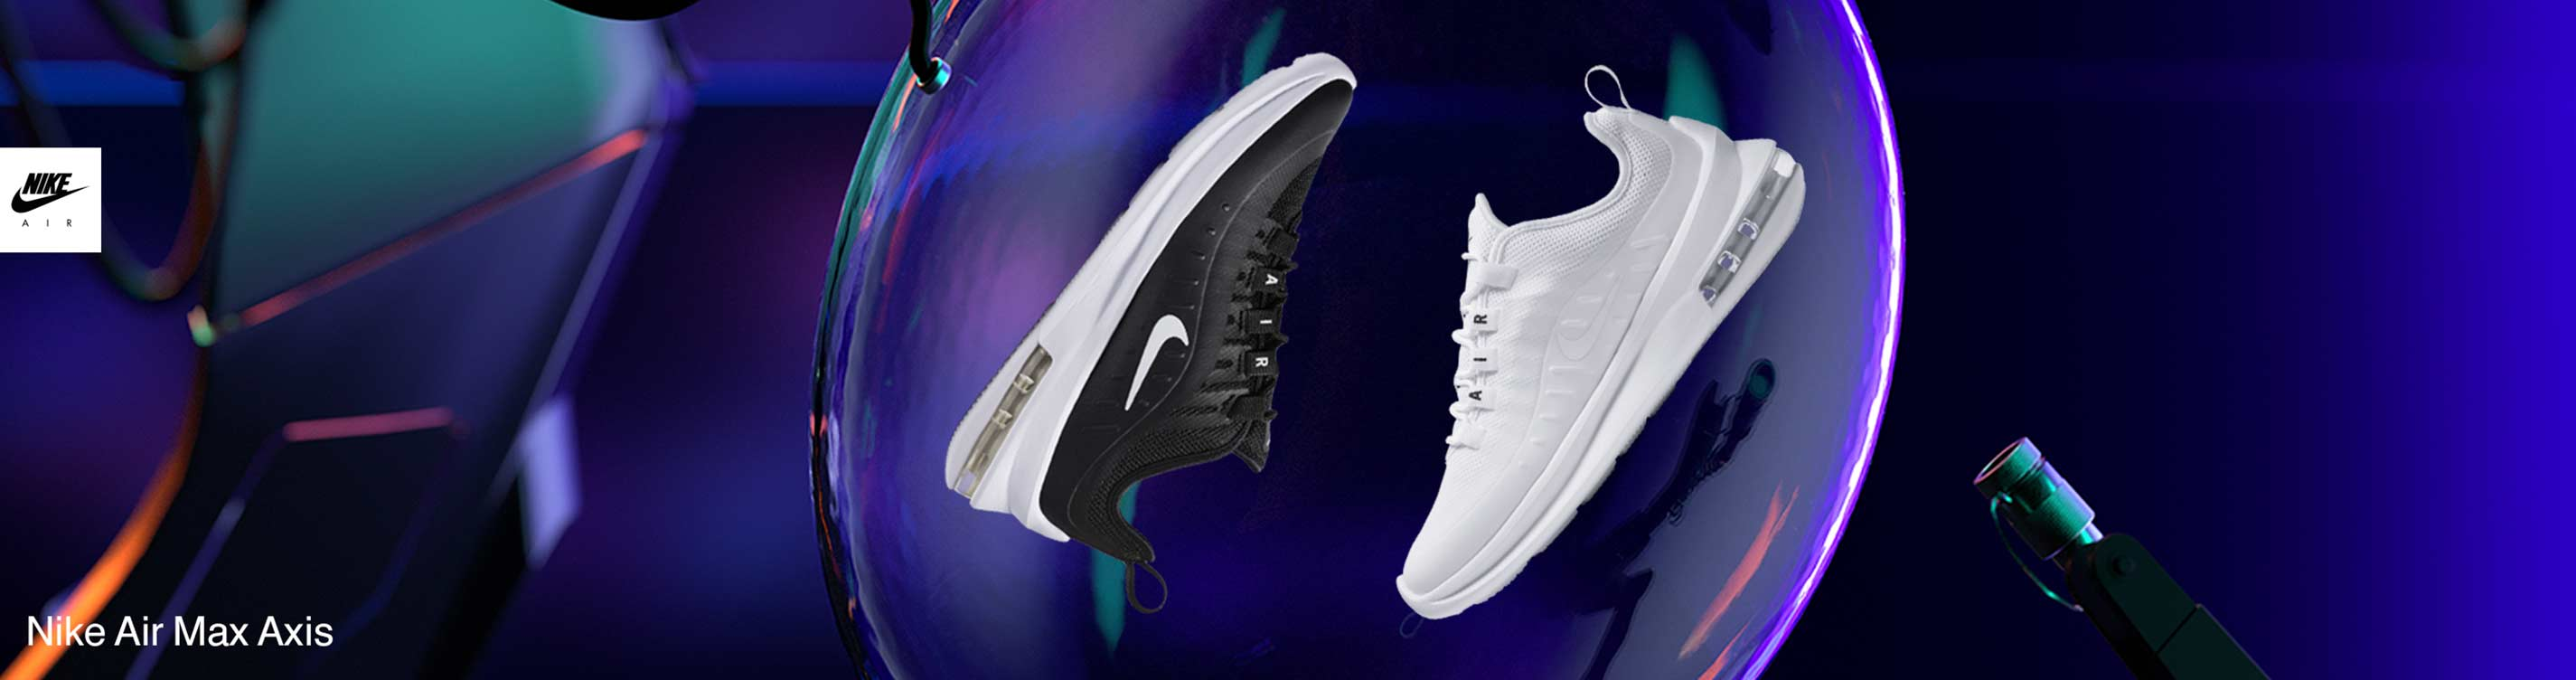 Banner-Nike